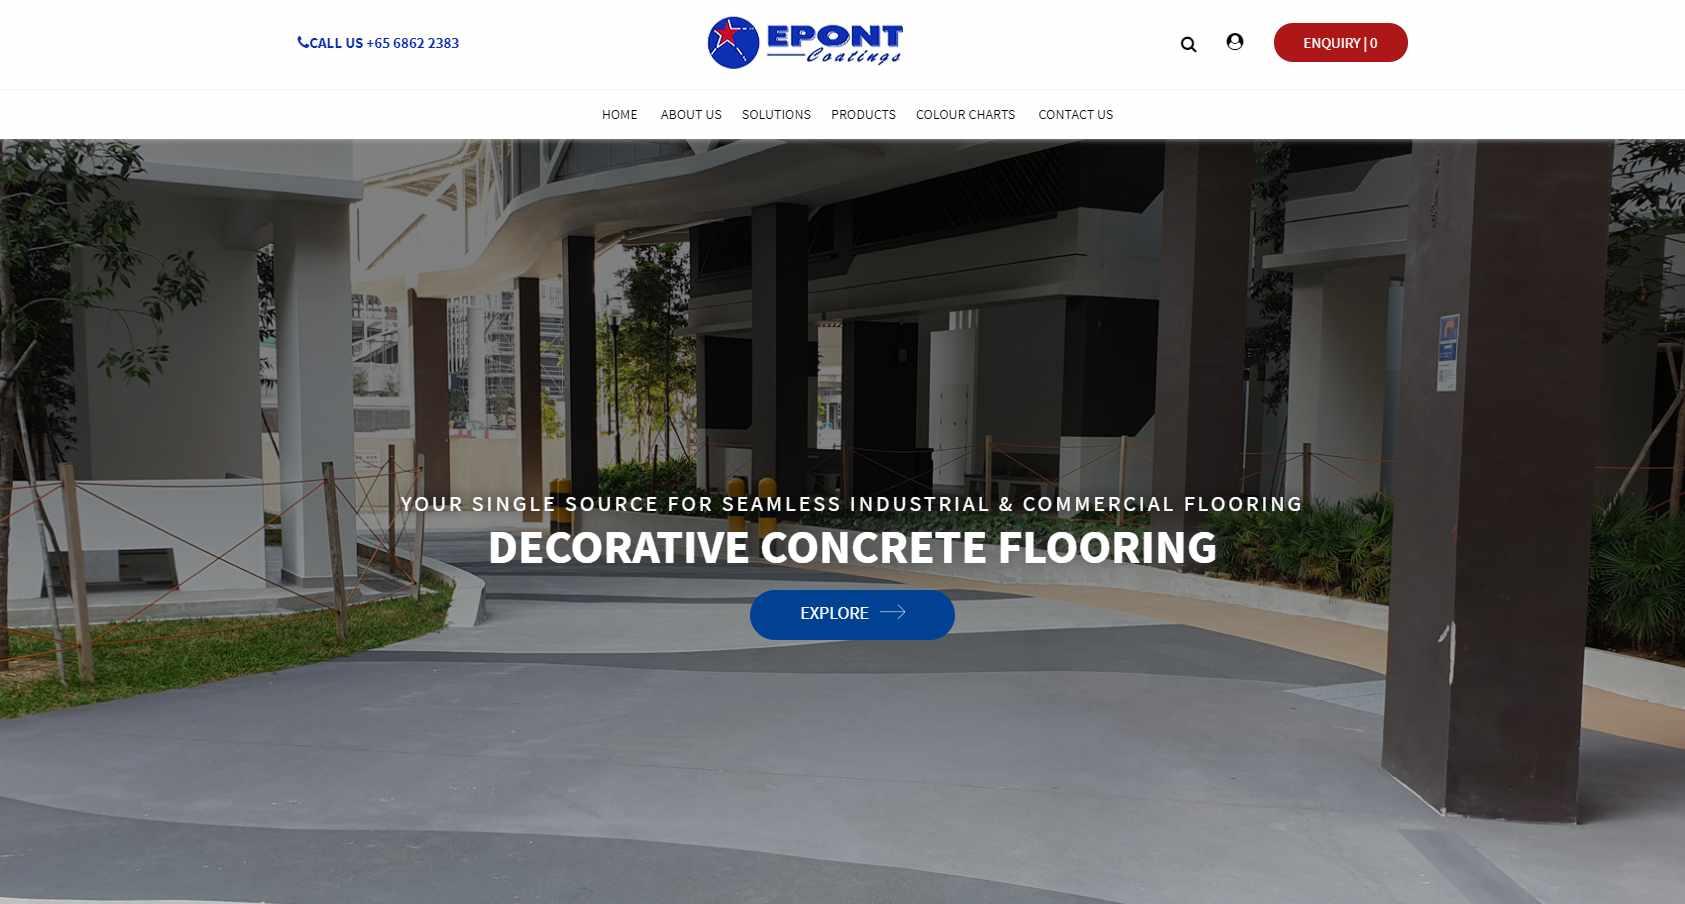 epont Top Epoxy Flooring Provider in Singapore